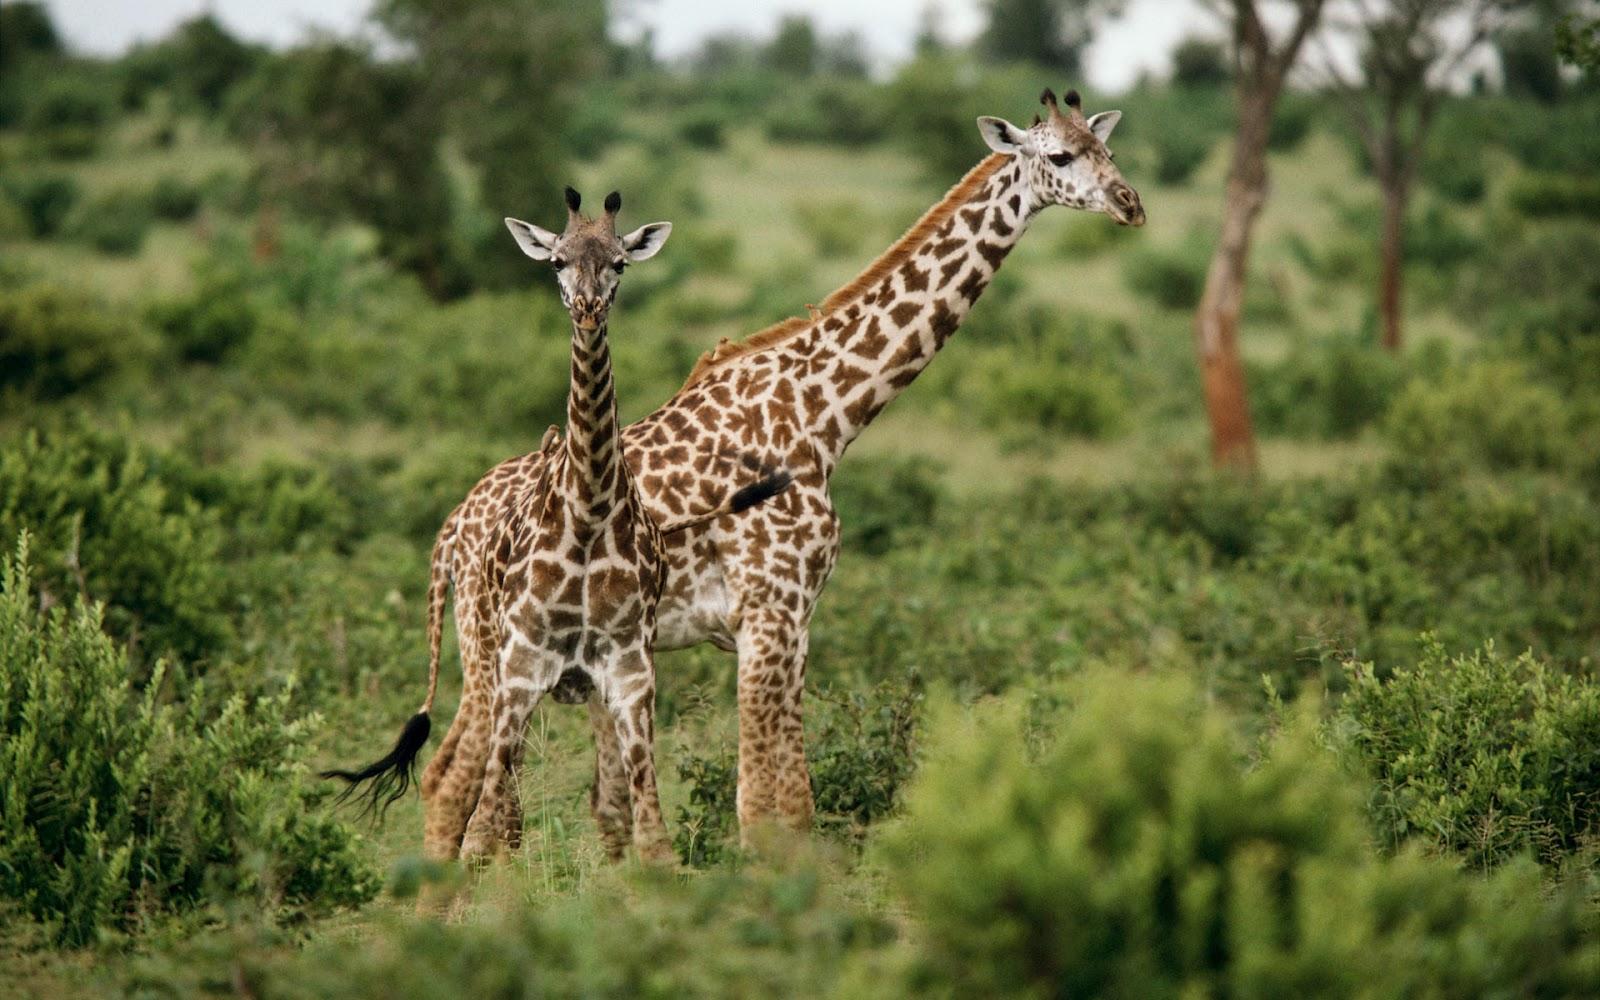 Afrika Wilde Dieren Achtergronden  HD Wallpapers